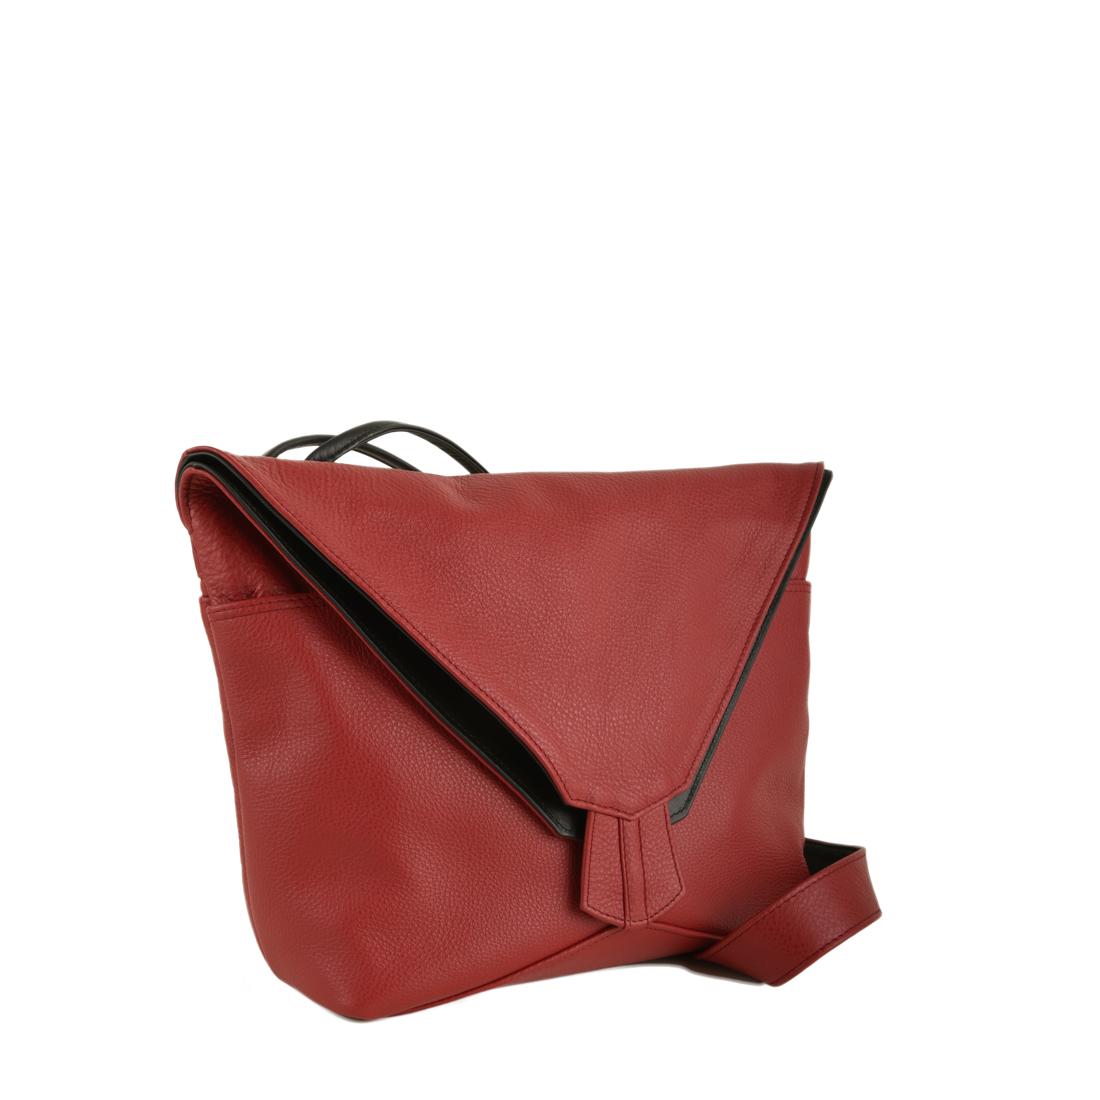 Emma Red Across Body Bag